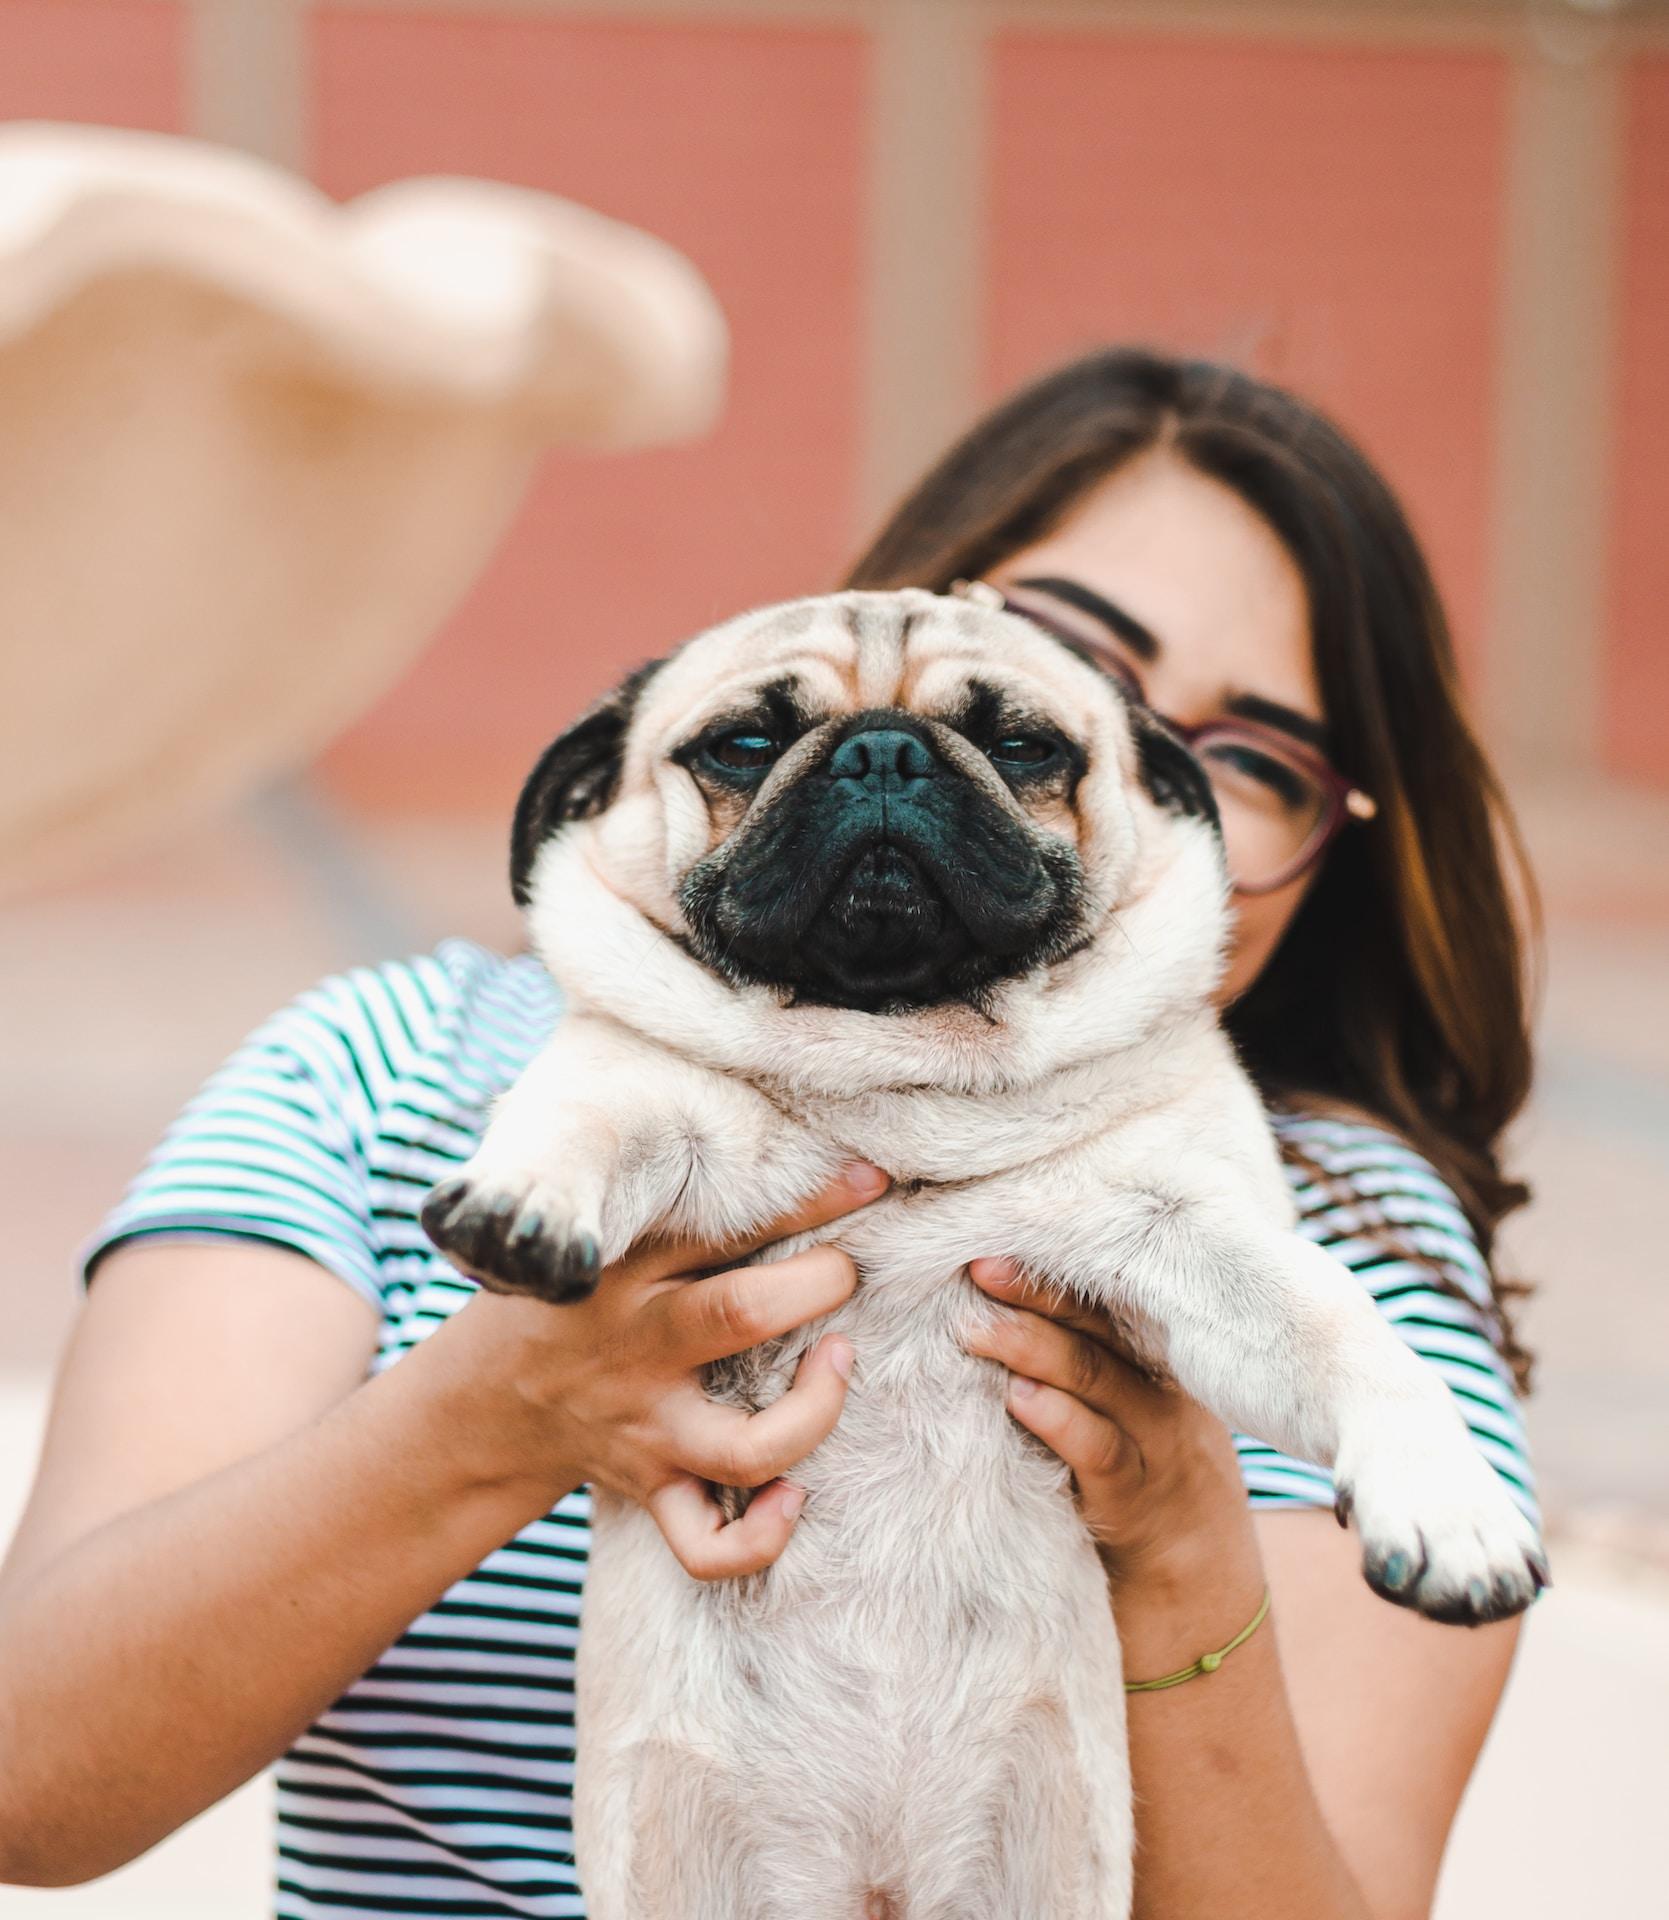 woman holding Pug puppy